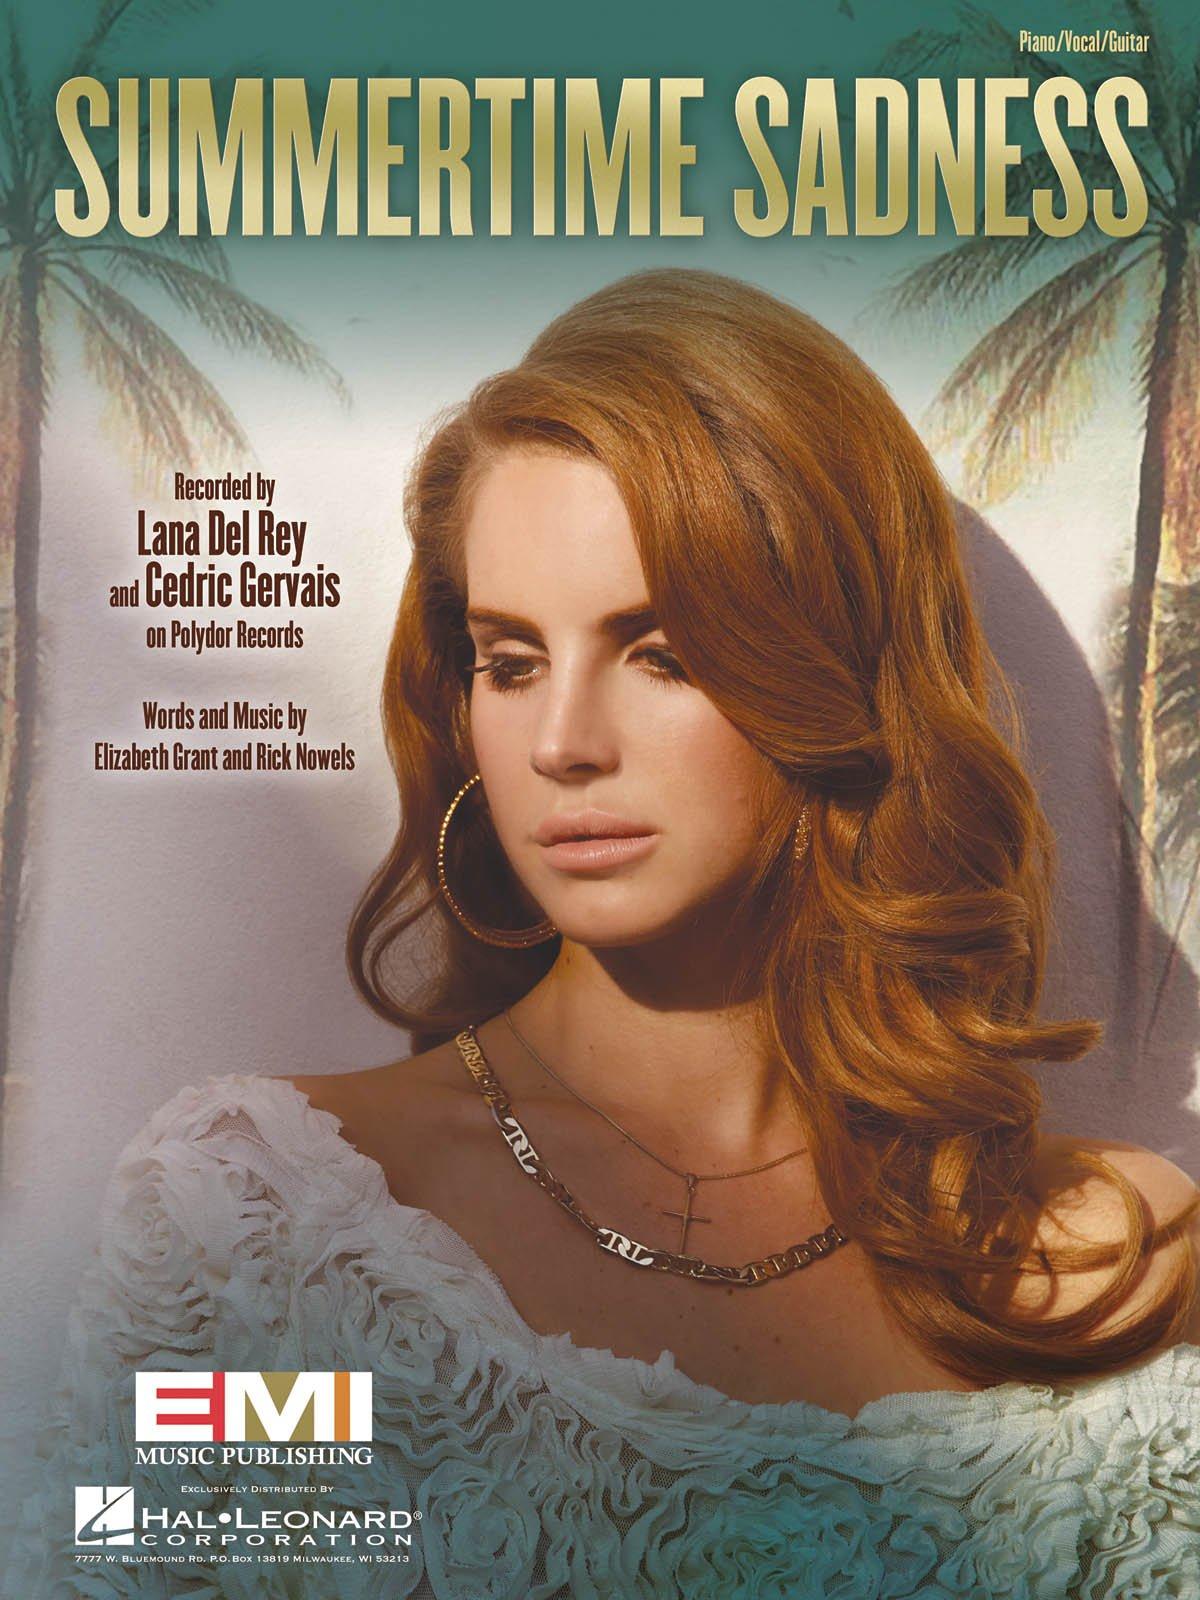 Lana Del Rey Summertime Sadness Sheet Music Single 0884088956707 Amazon Com Books